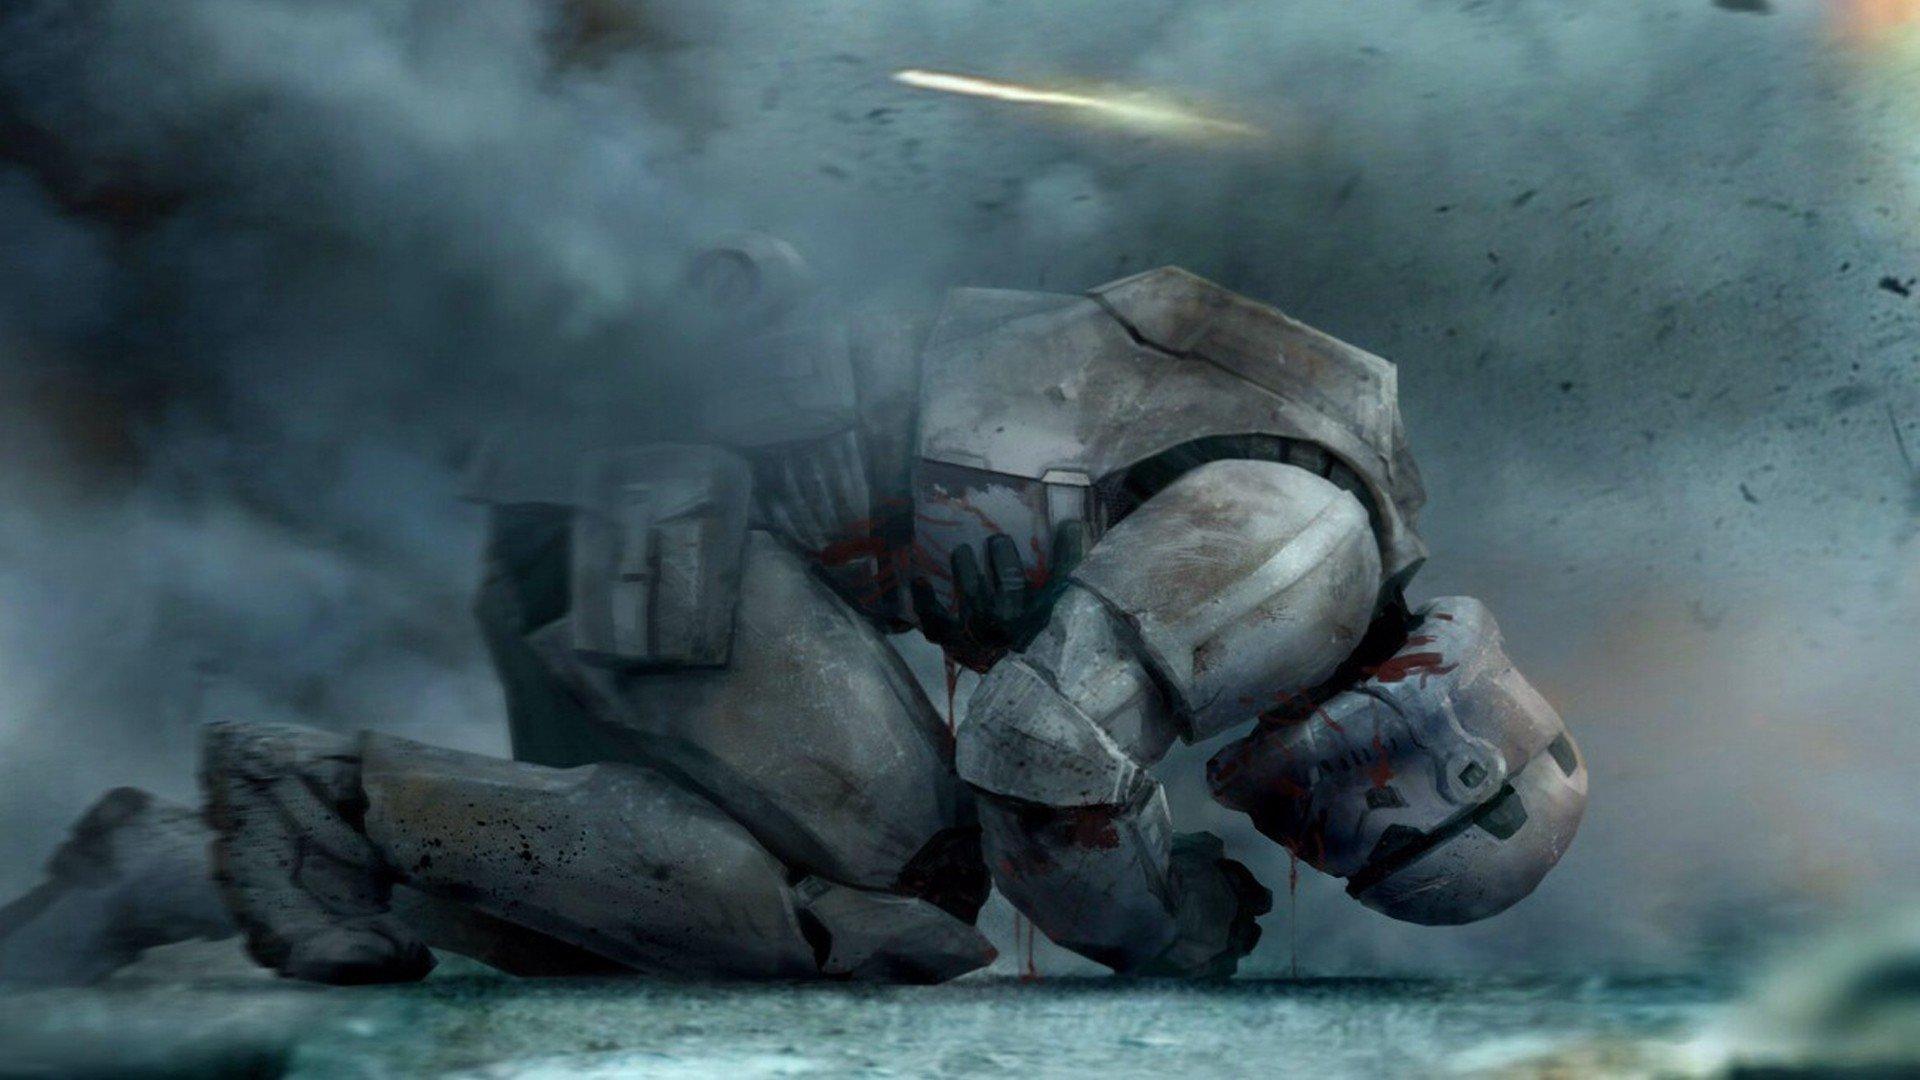 Free Download Download Hd 1080p Star Wars Desktop Wallpaper